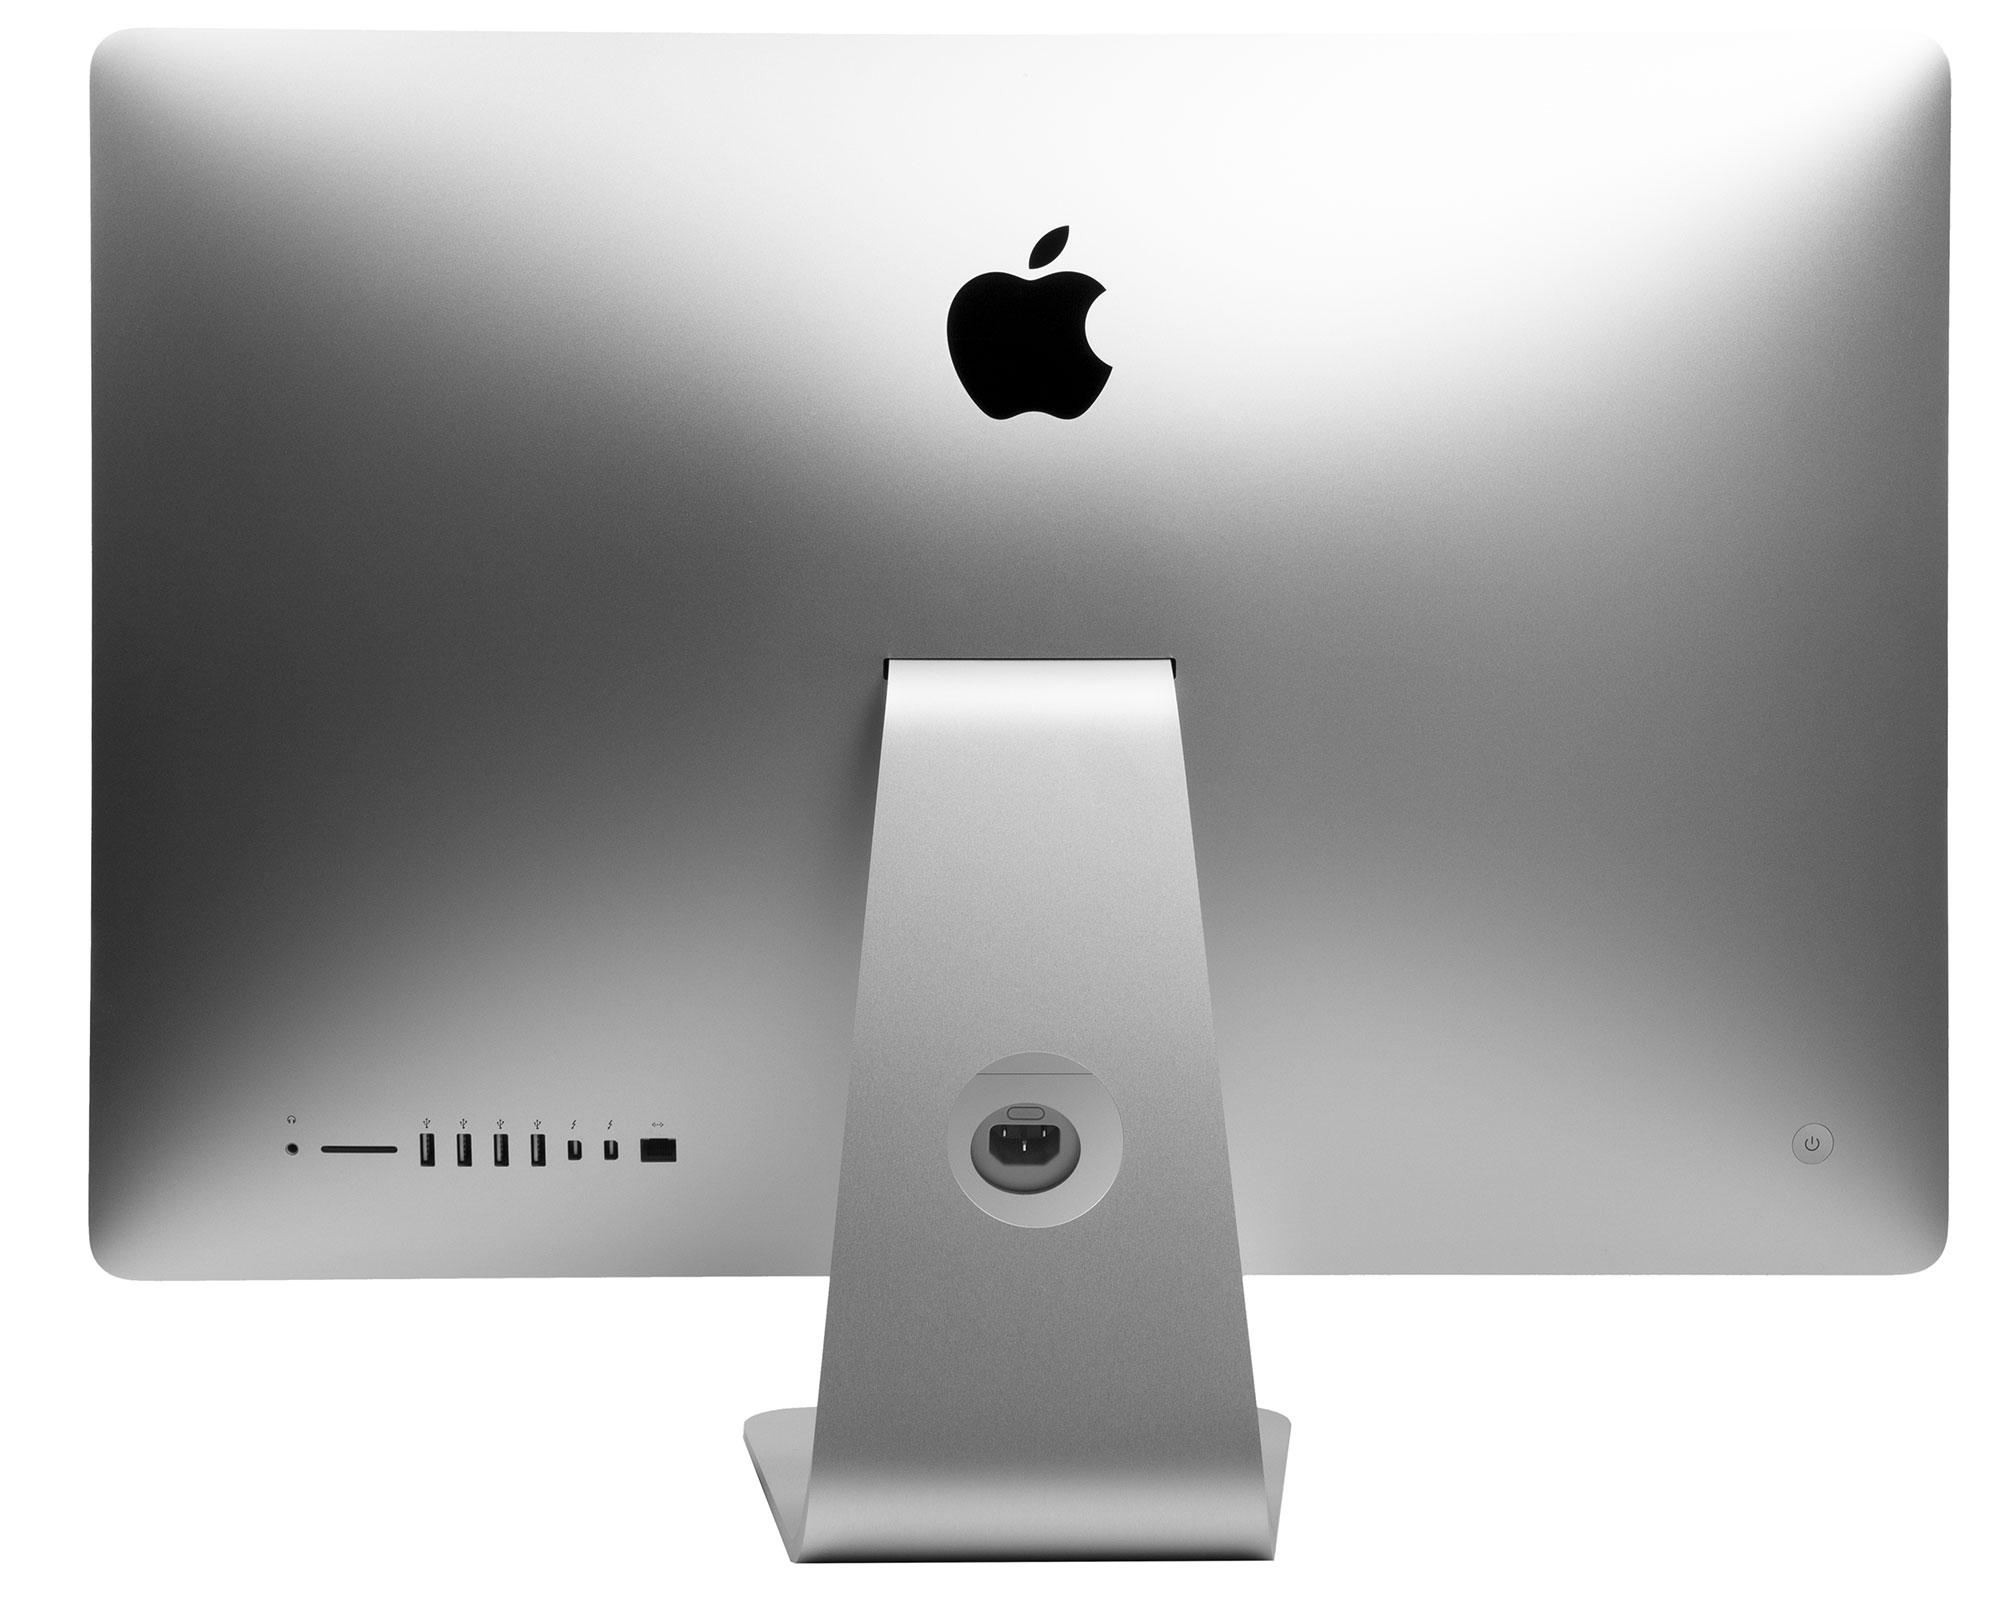 iMac Leasing